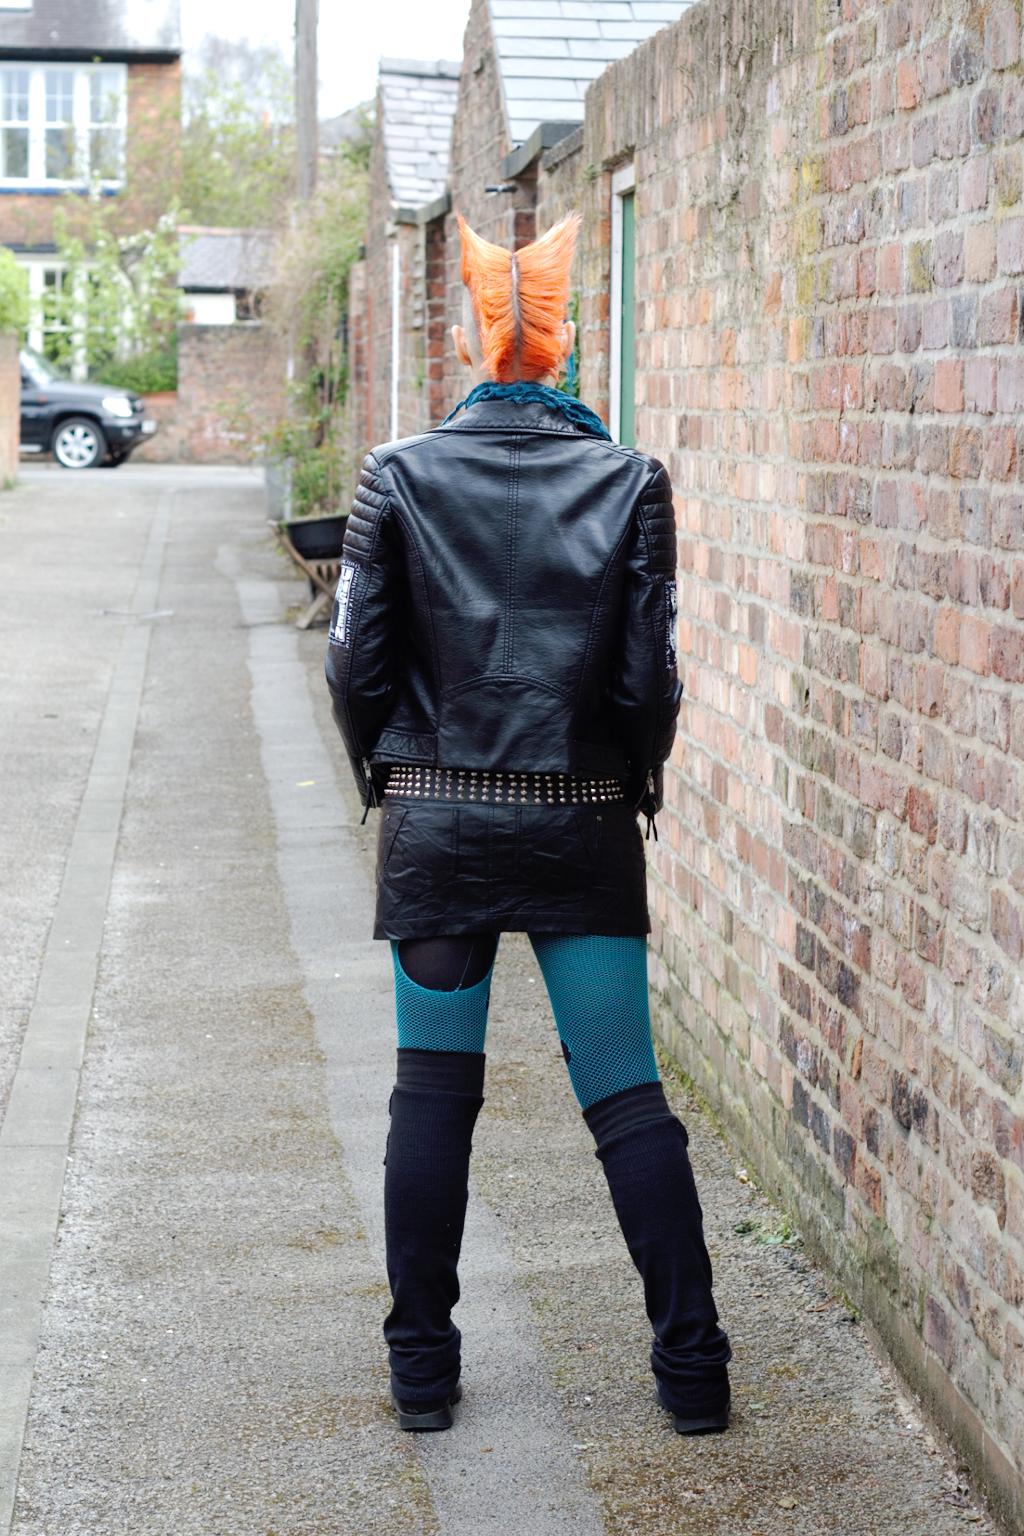 Projekt Lederjacke & politische Gedanken - Outfit - Zebraspider DIY Anti-Fashion Blog